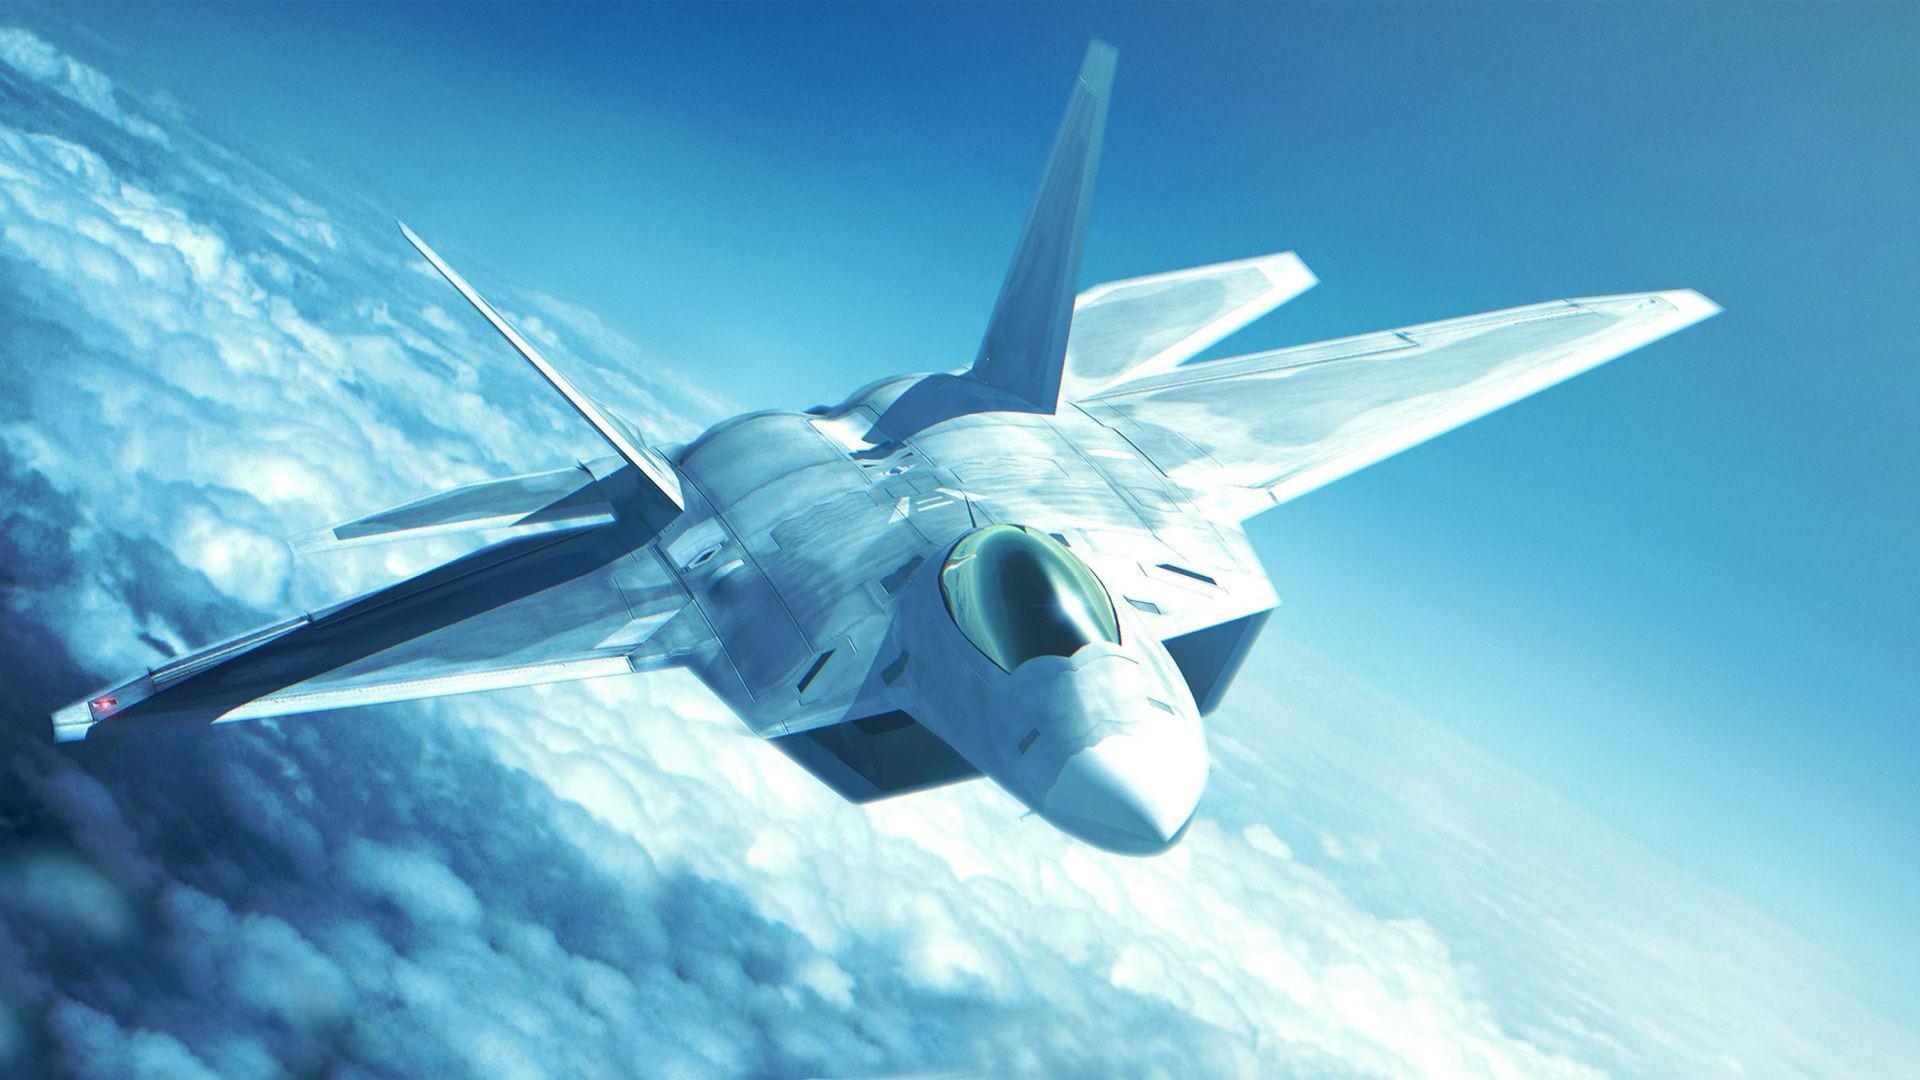 Aviation 3d Live Wallpaper Cool 1080p Wallpapers